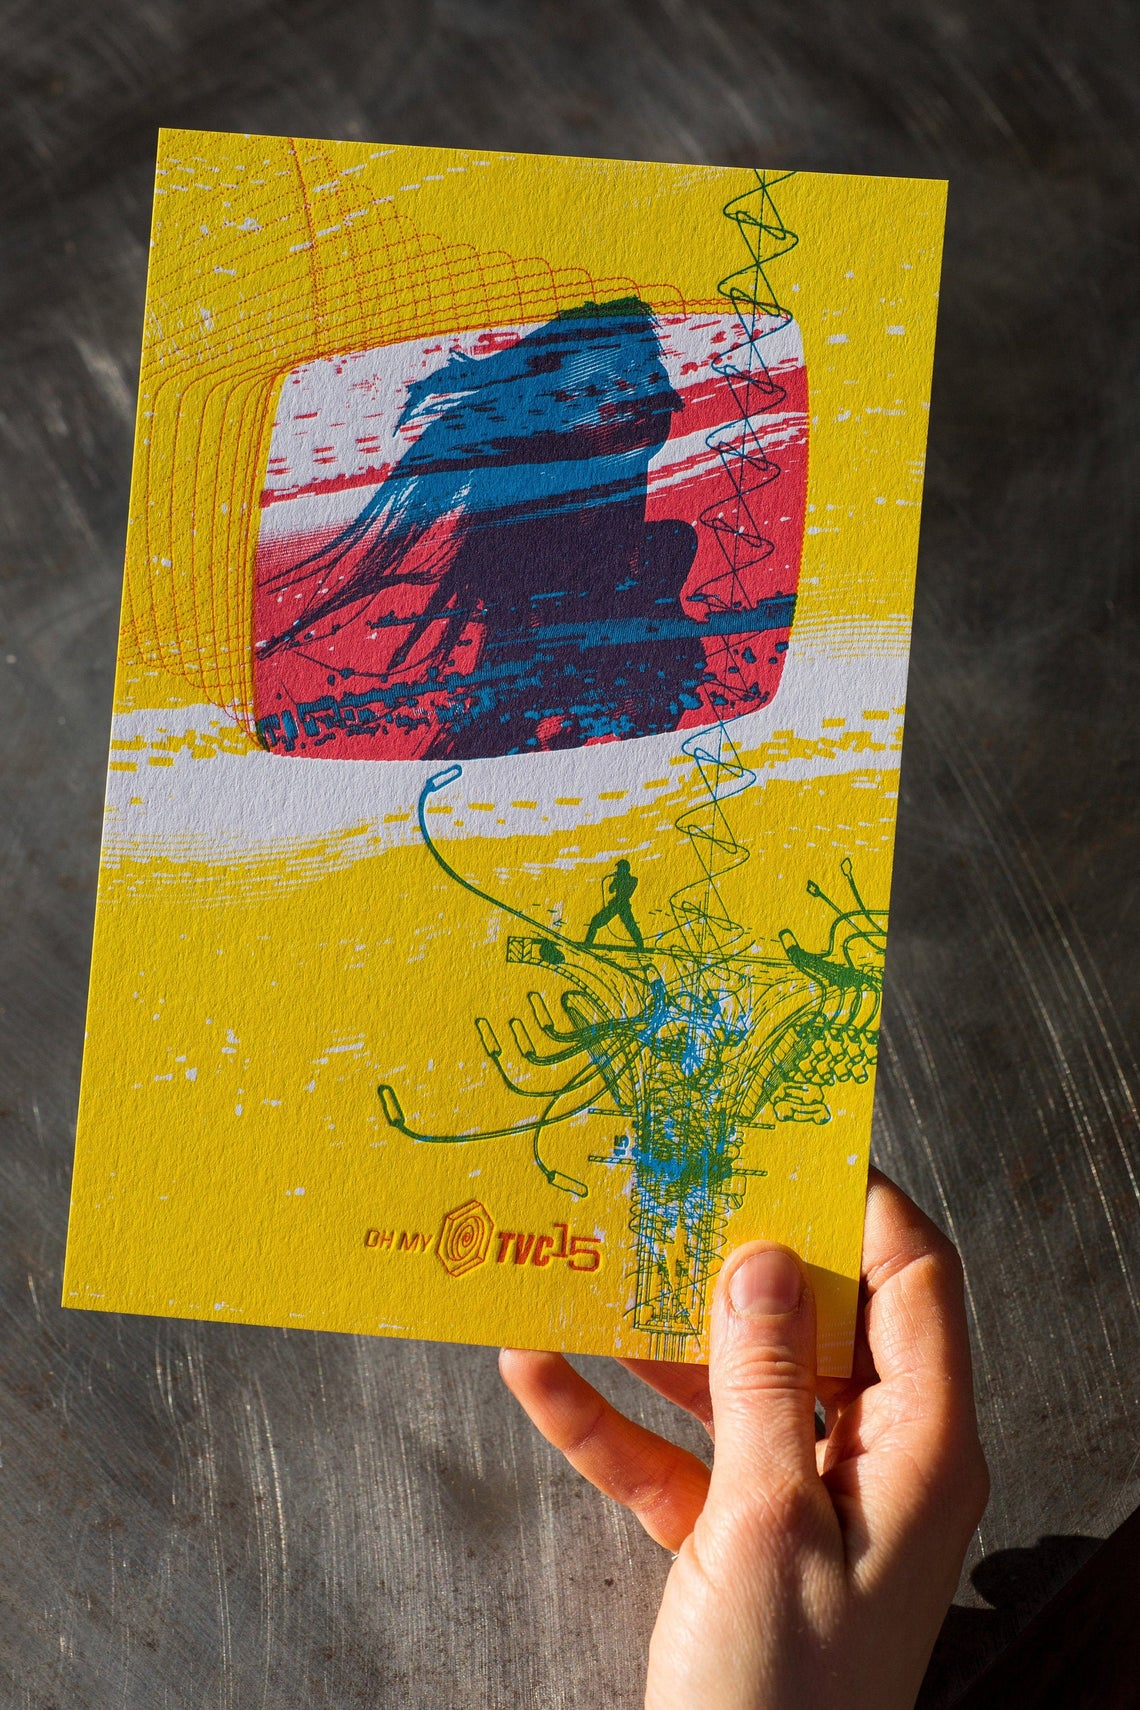 Bowie-Art-Print-Letterpress-tvc15-3